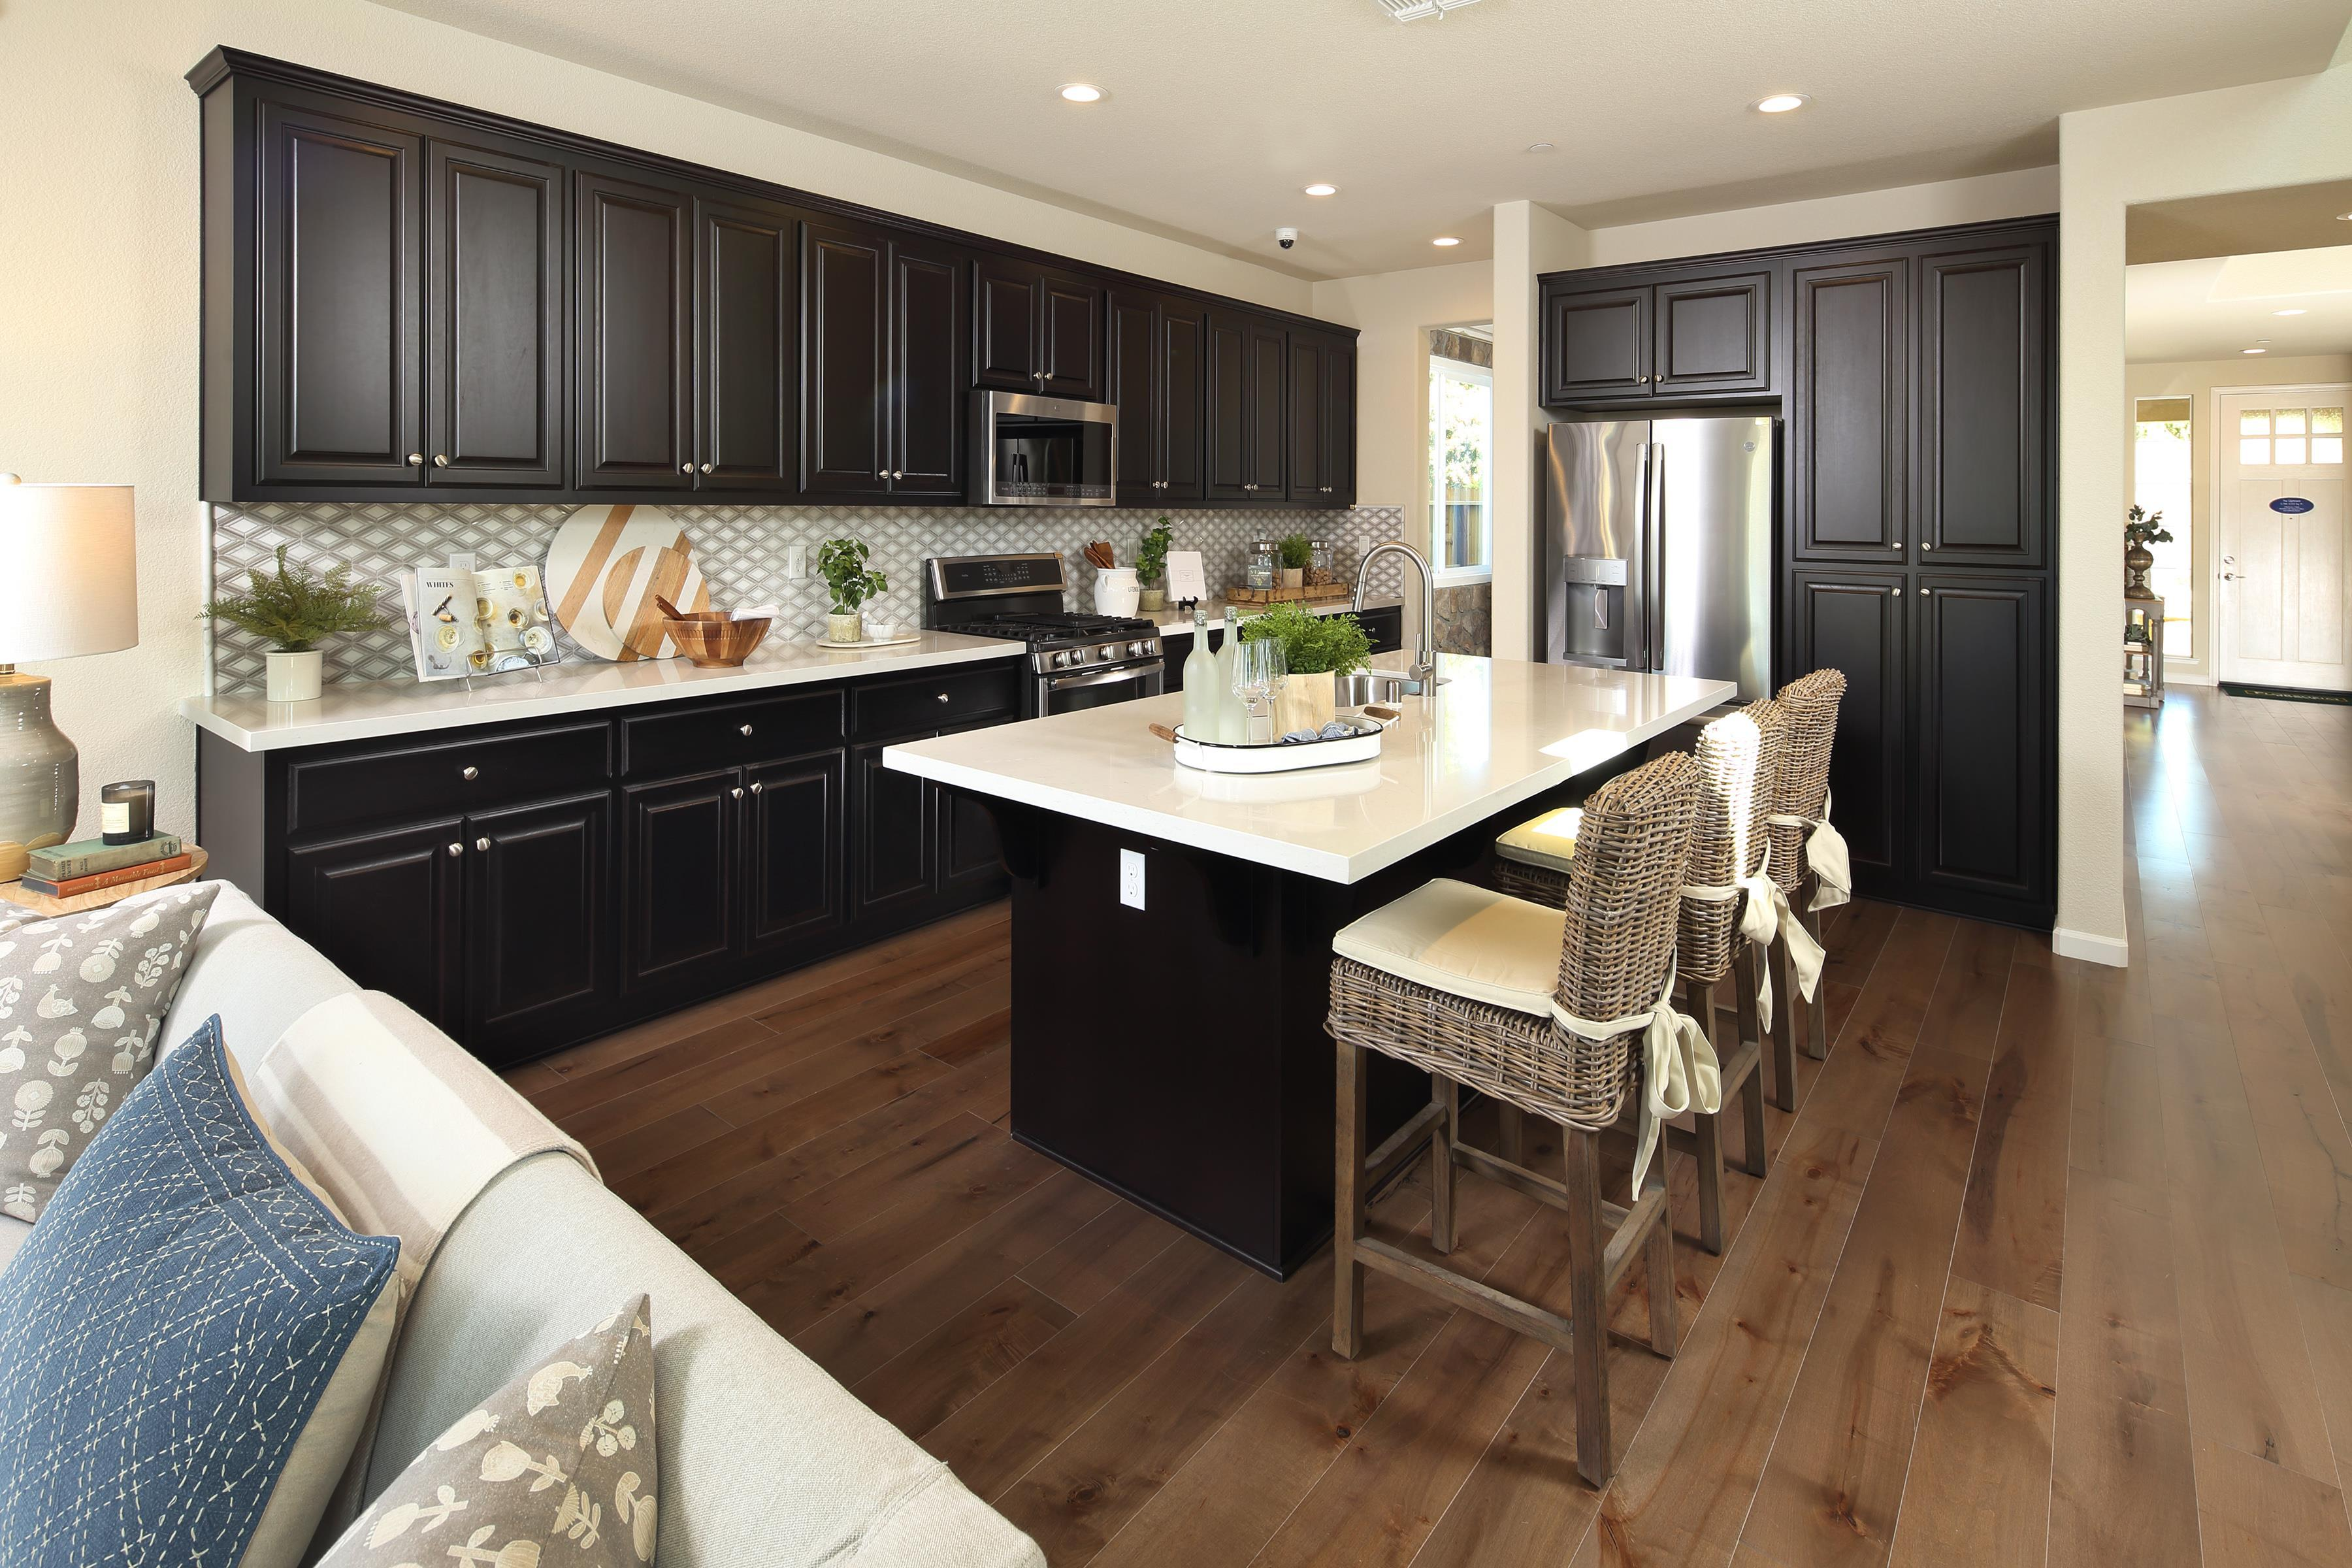 Kitchen featured in The Uptown By Florsheim Homes in Modesto, CA